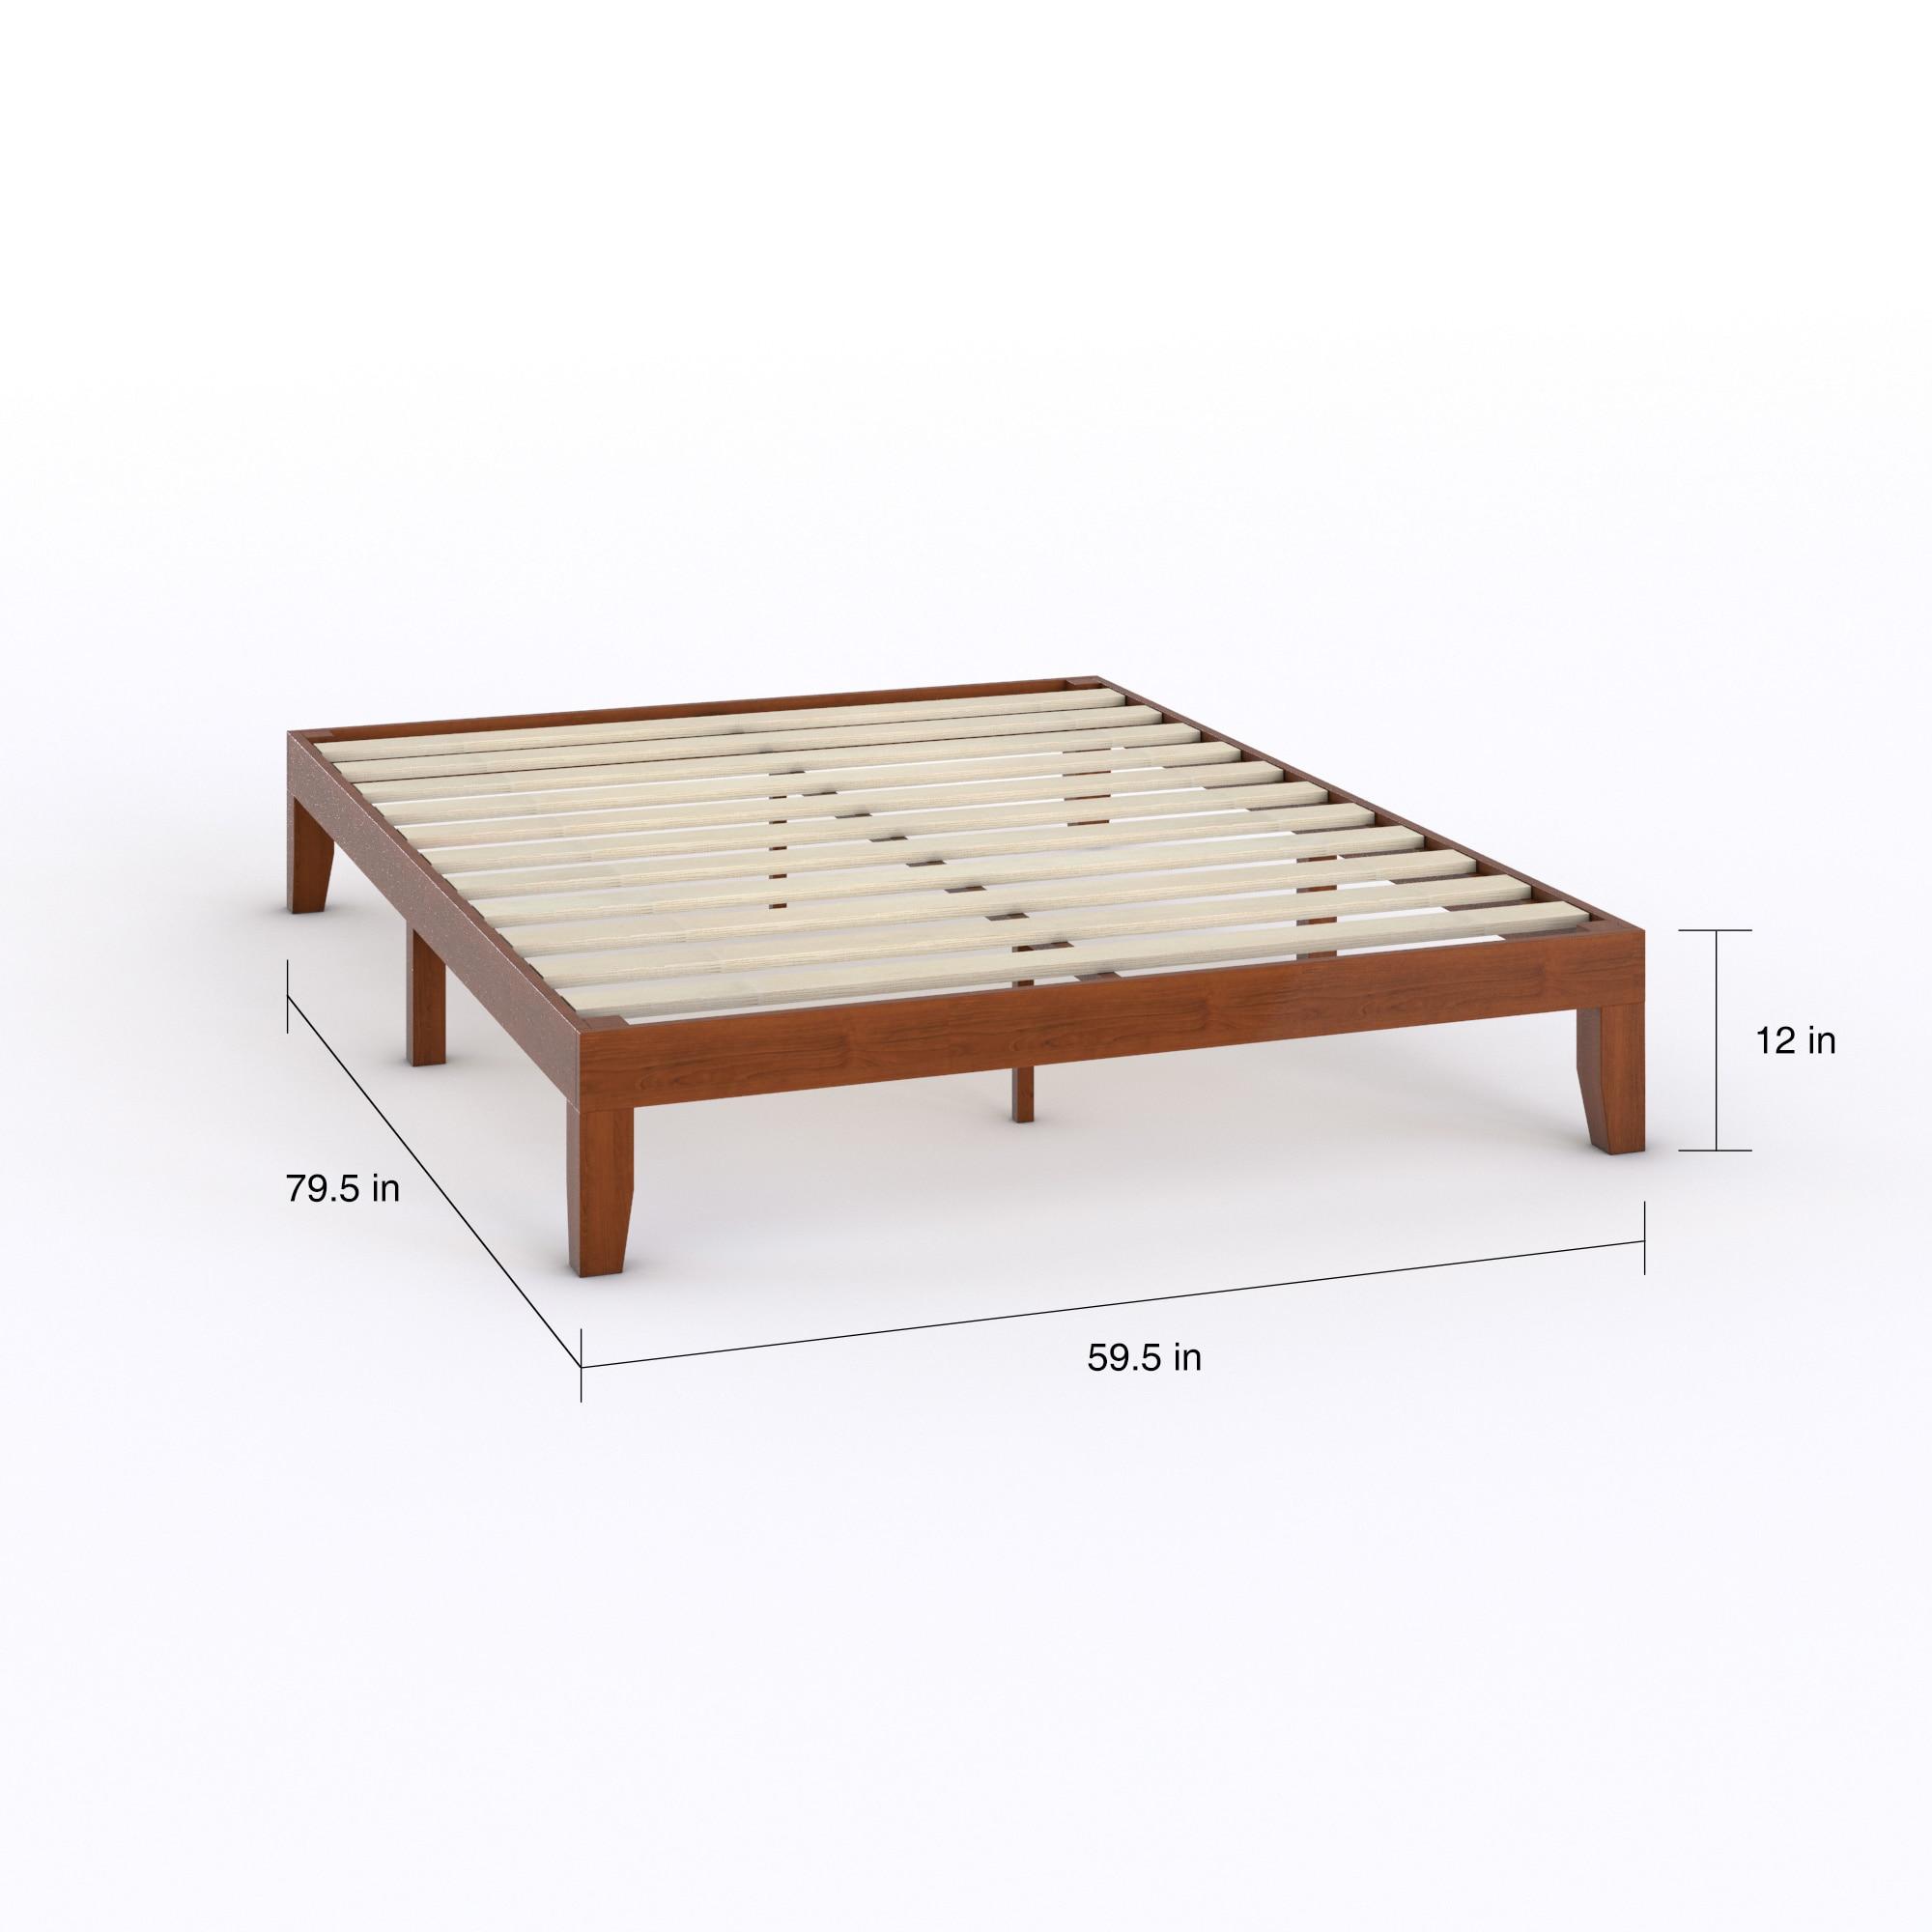 white p platform depot alt beds the size wood queen home bed manhattan altozzo headboards wht